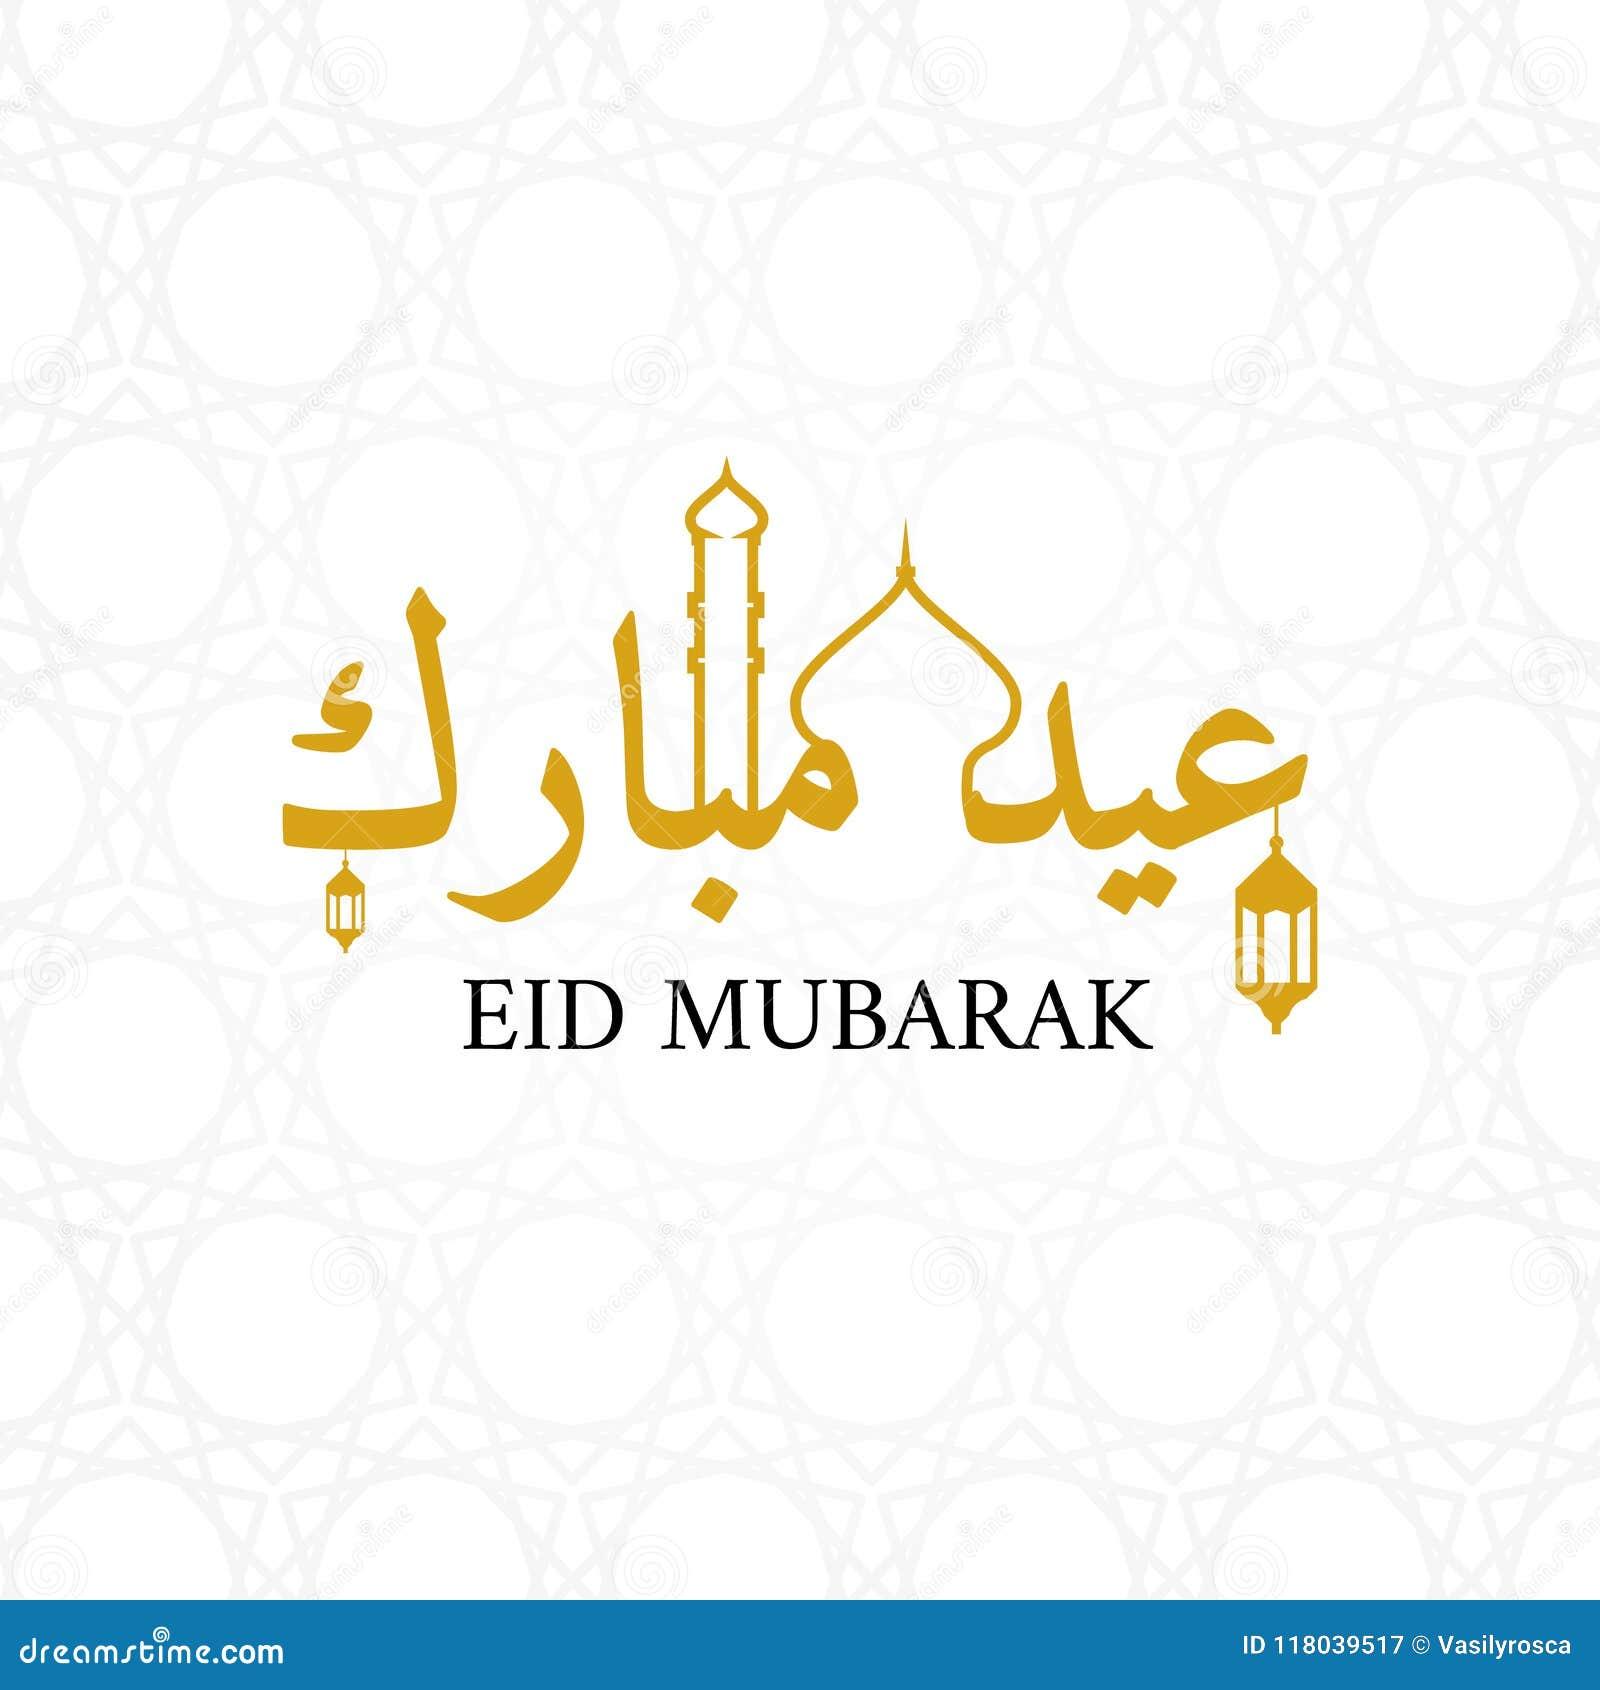 Eid mubarak greeting card vector design ramadan islam arabic download eid mubarak greeting card vector design ramadan islam arabic holiday muslim culture eid m4hsunfo